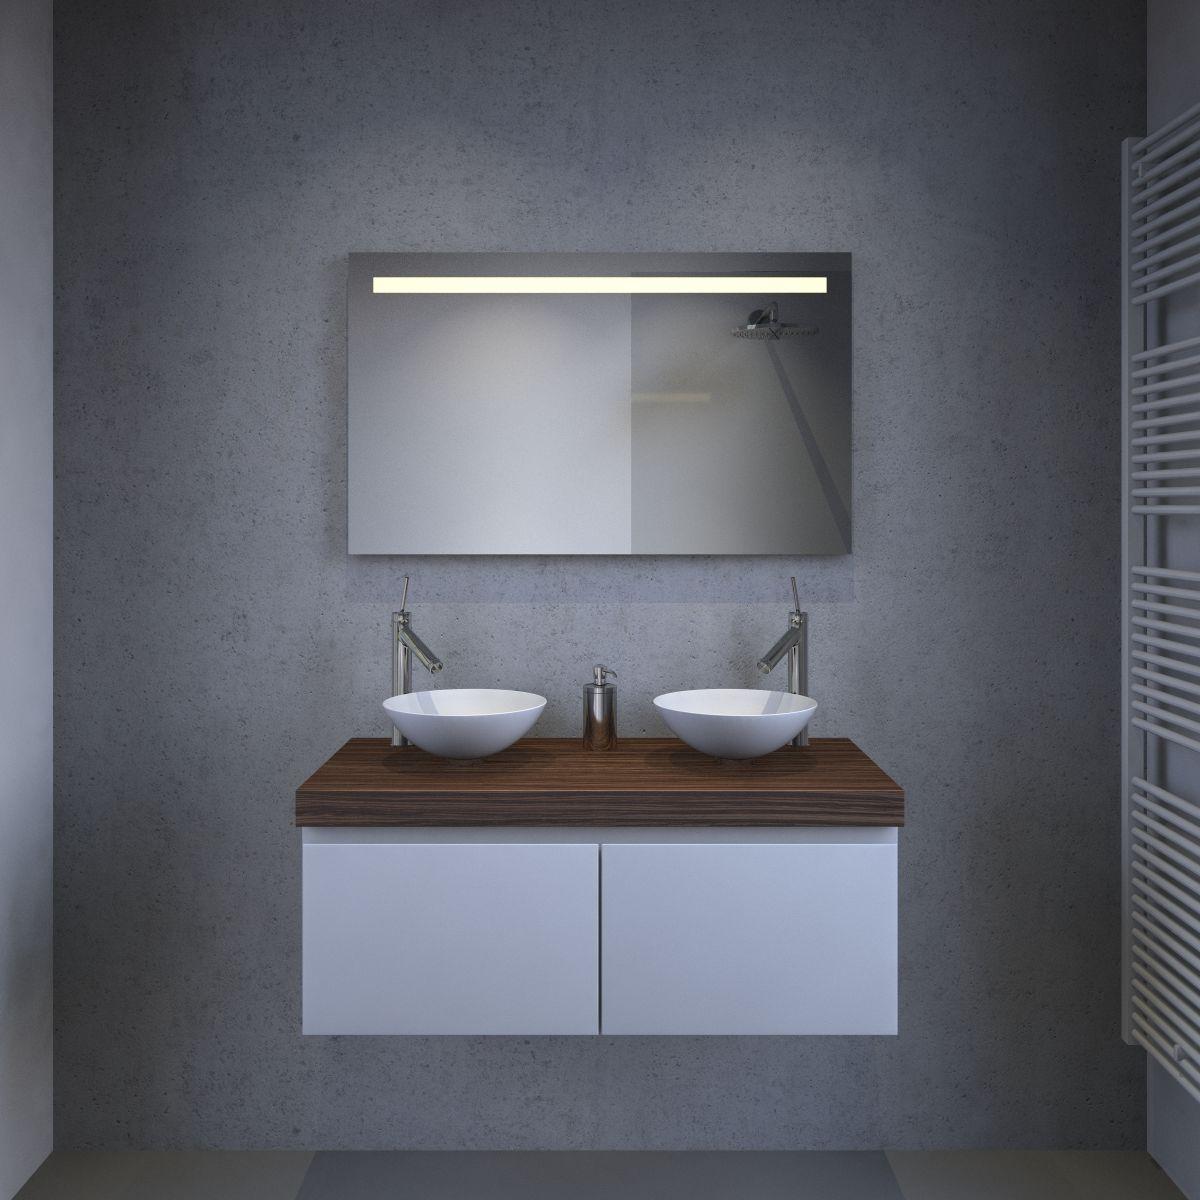 Spiegels met spiegelverwarming Spiegels met verlichting Spiegels met ...